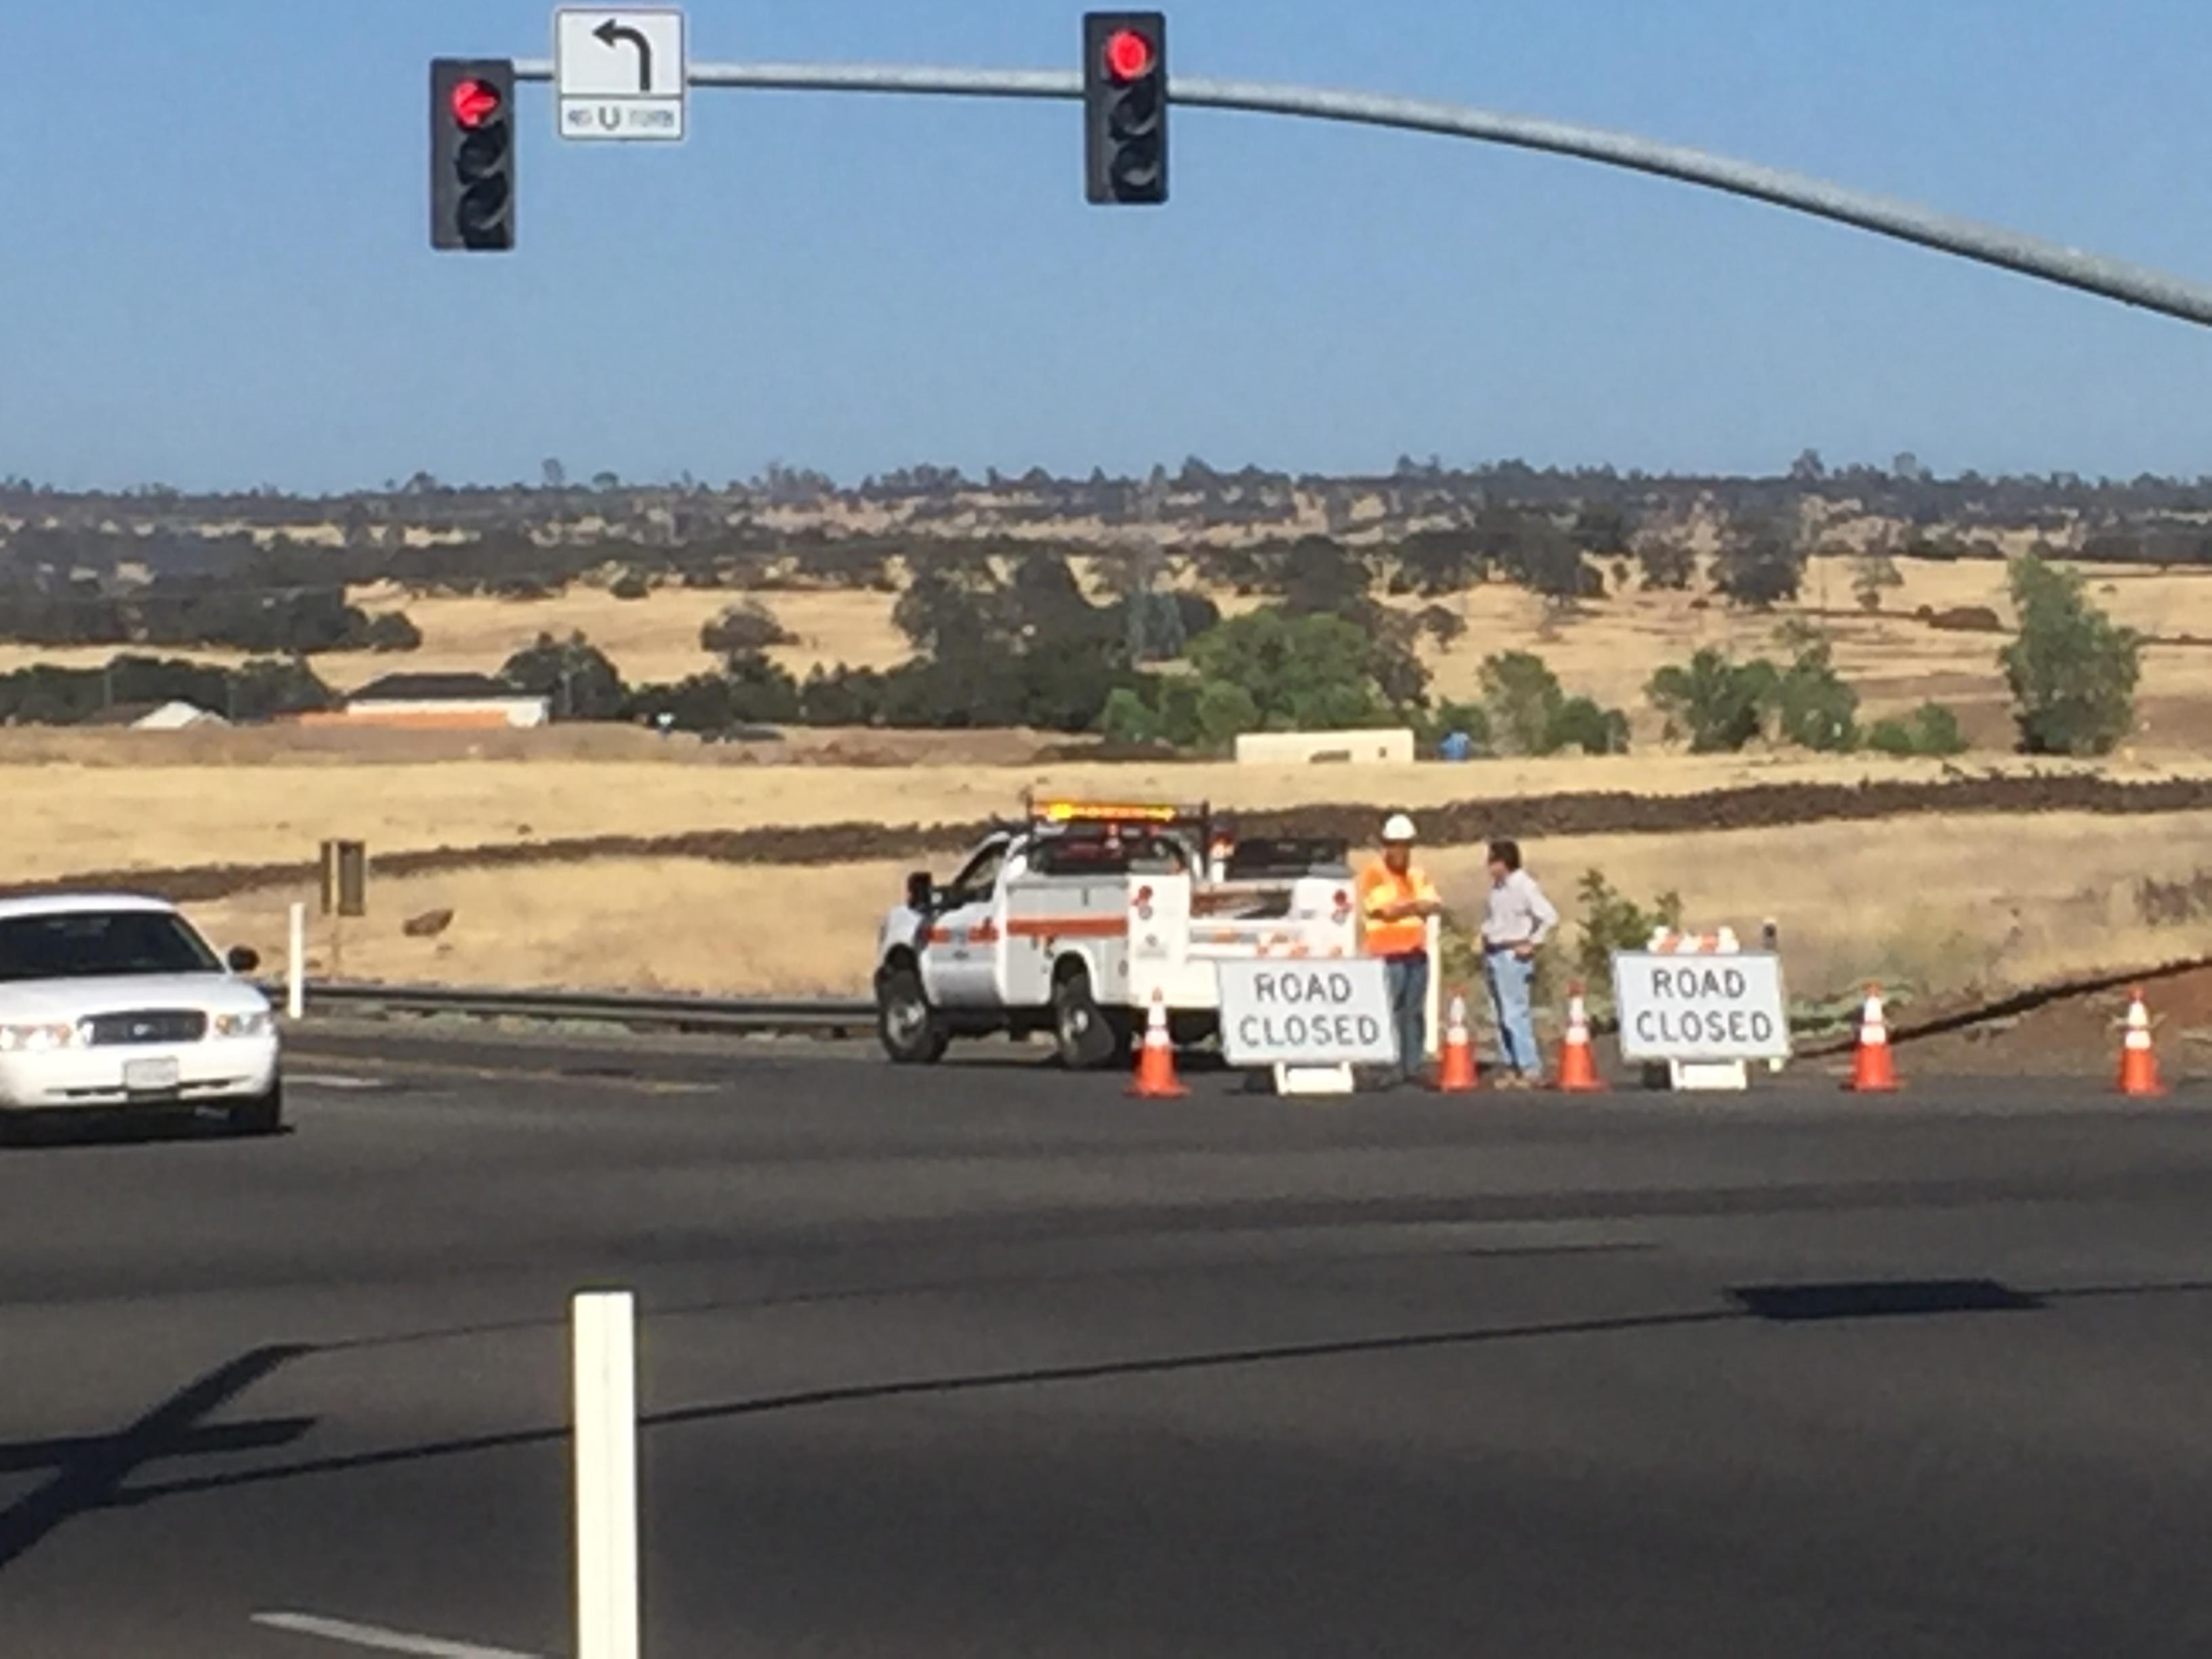 Brush Fire Burns Near California Park In Chico